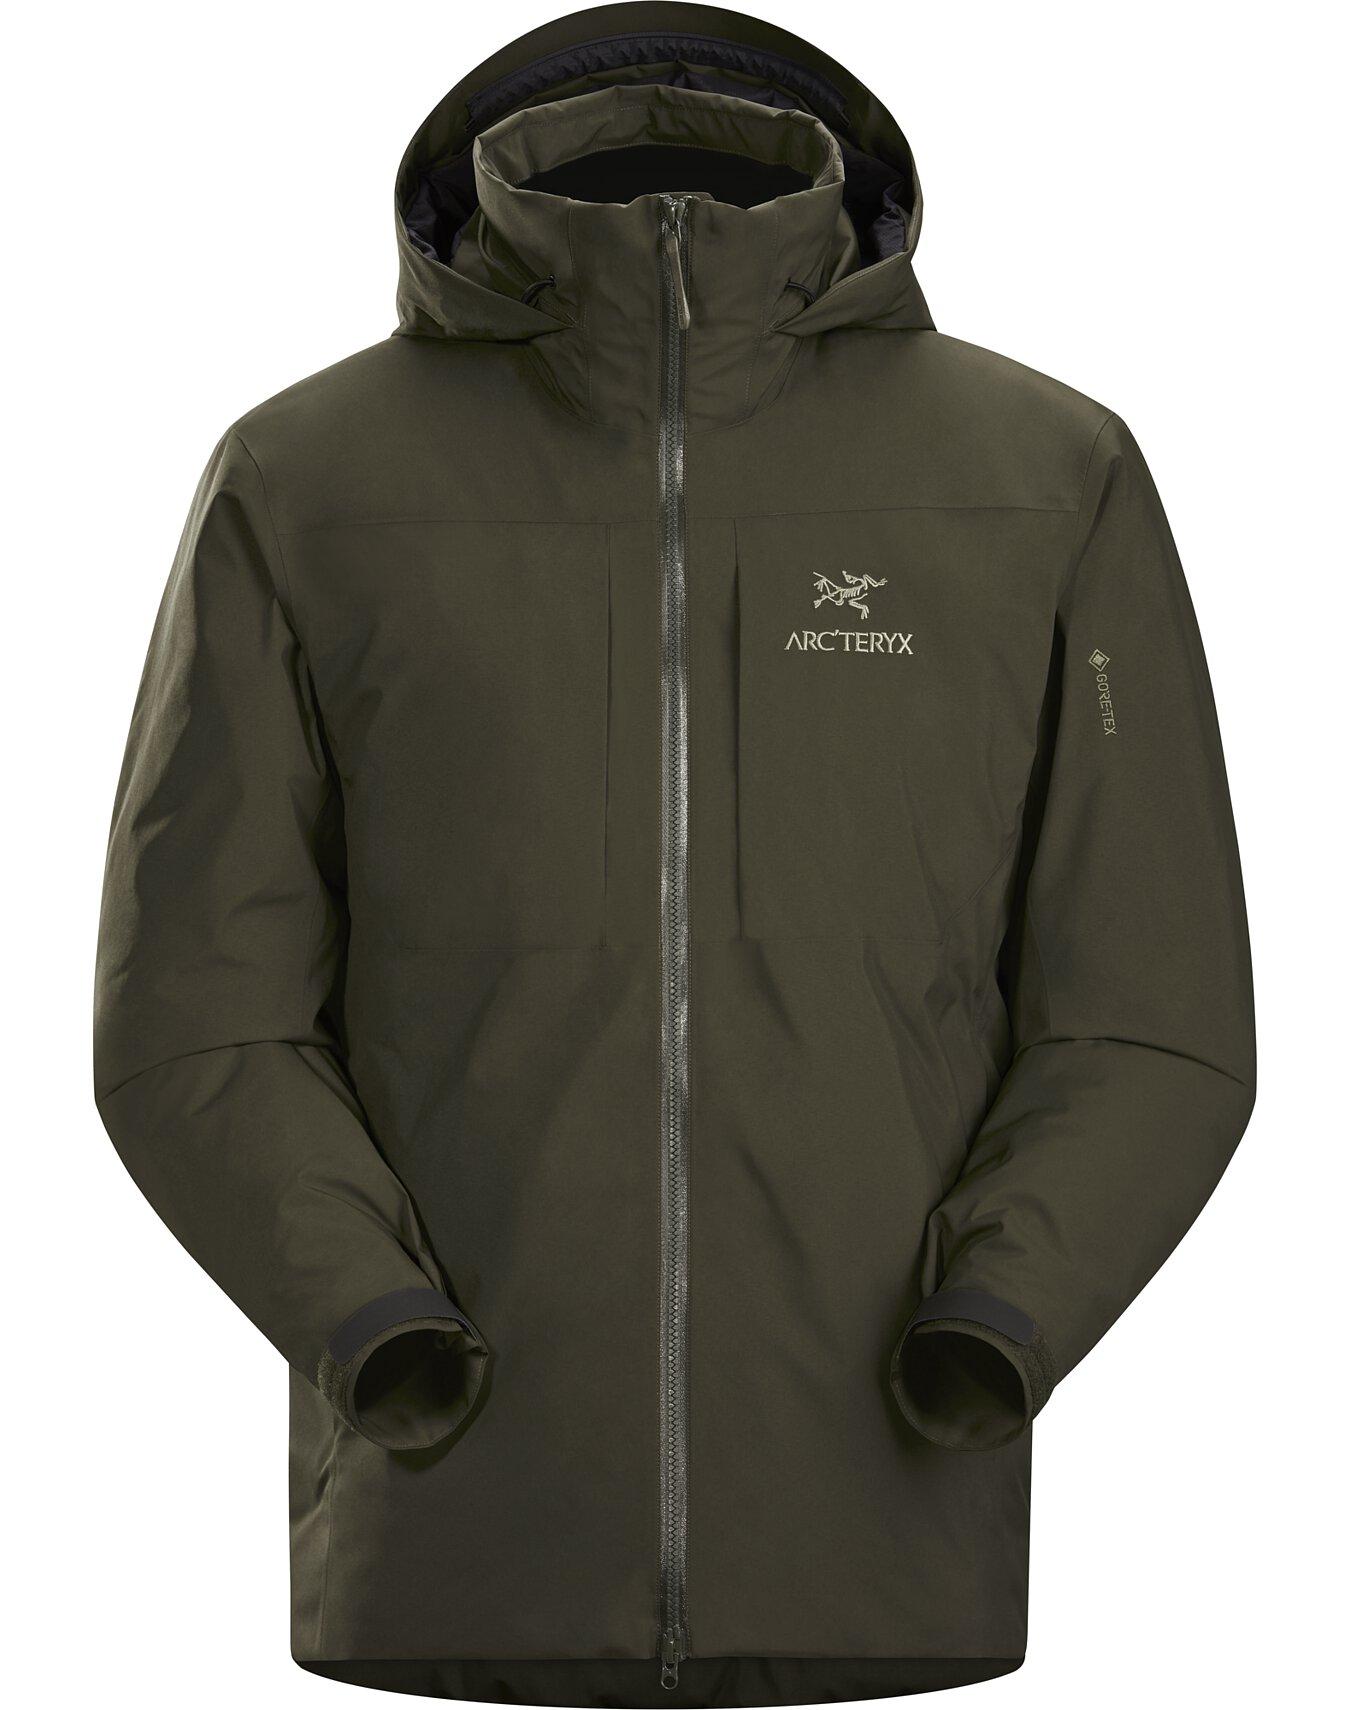 Fission SV Jacket Men's